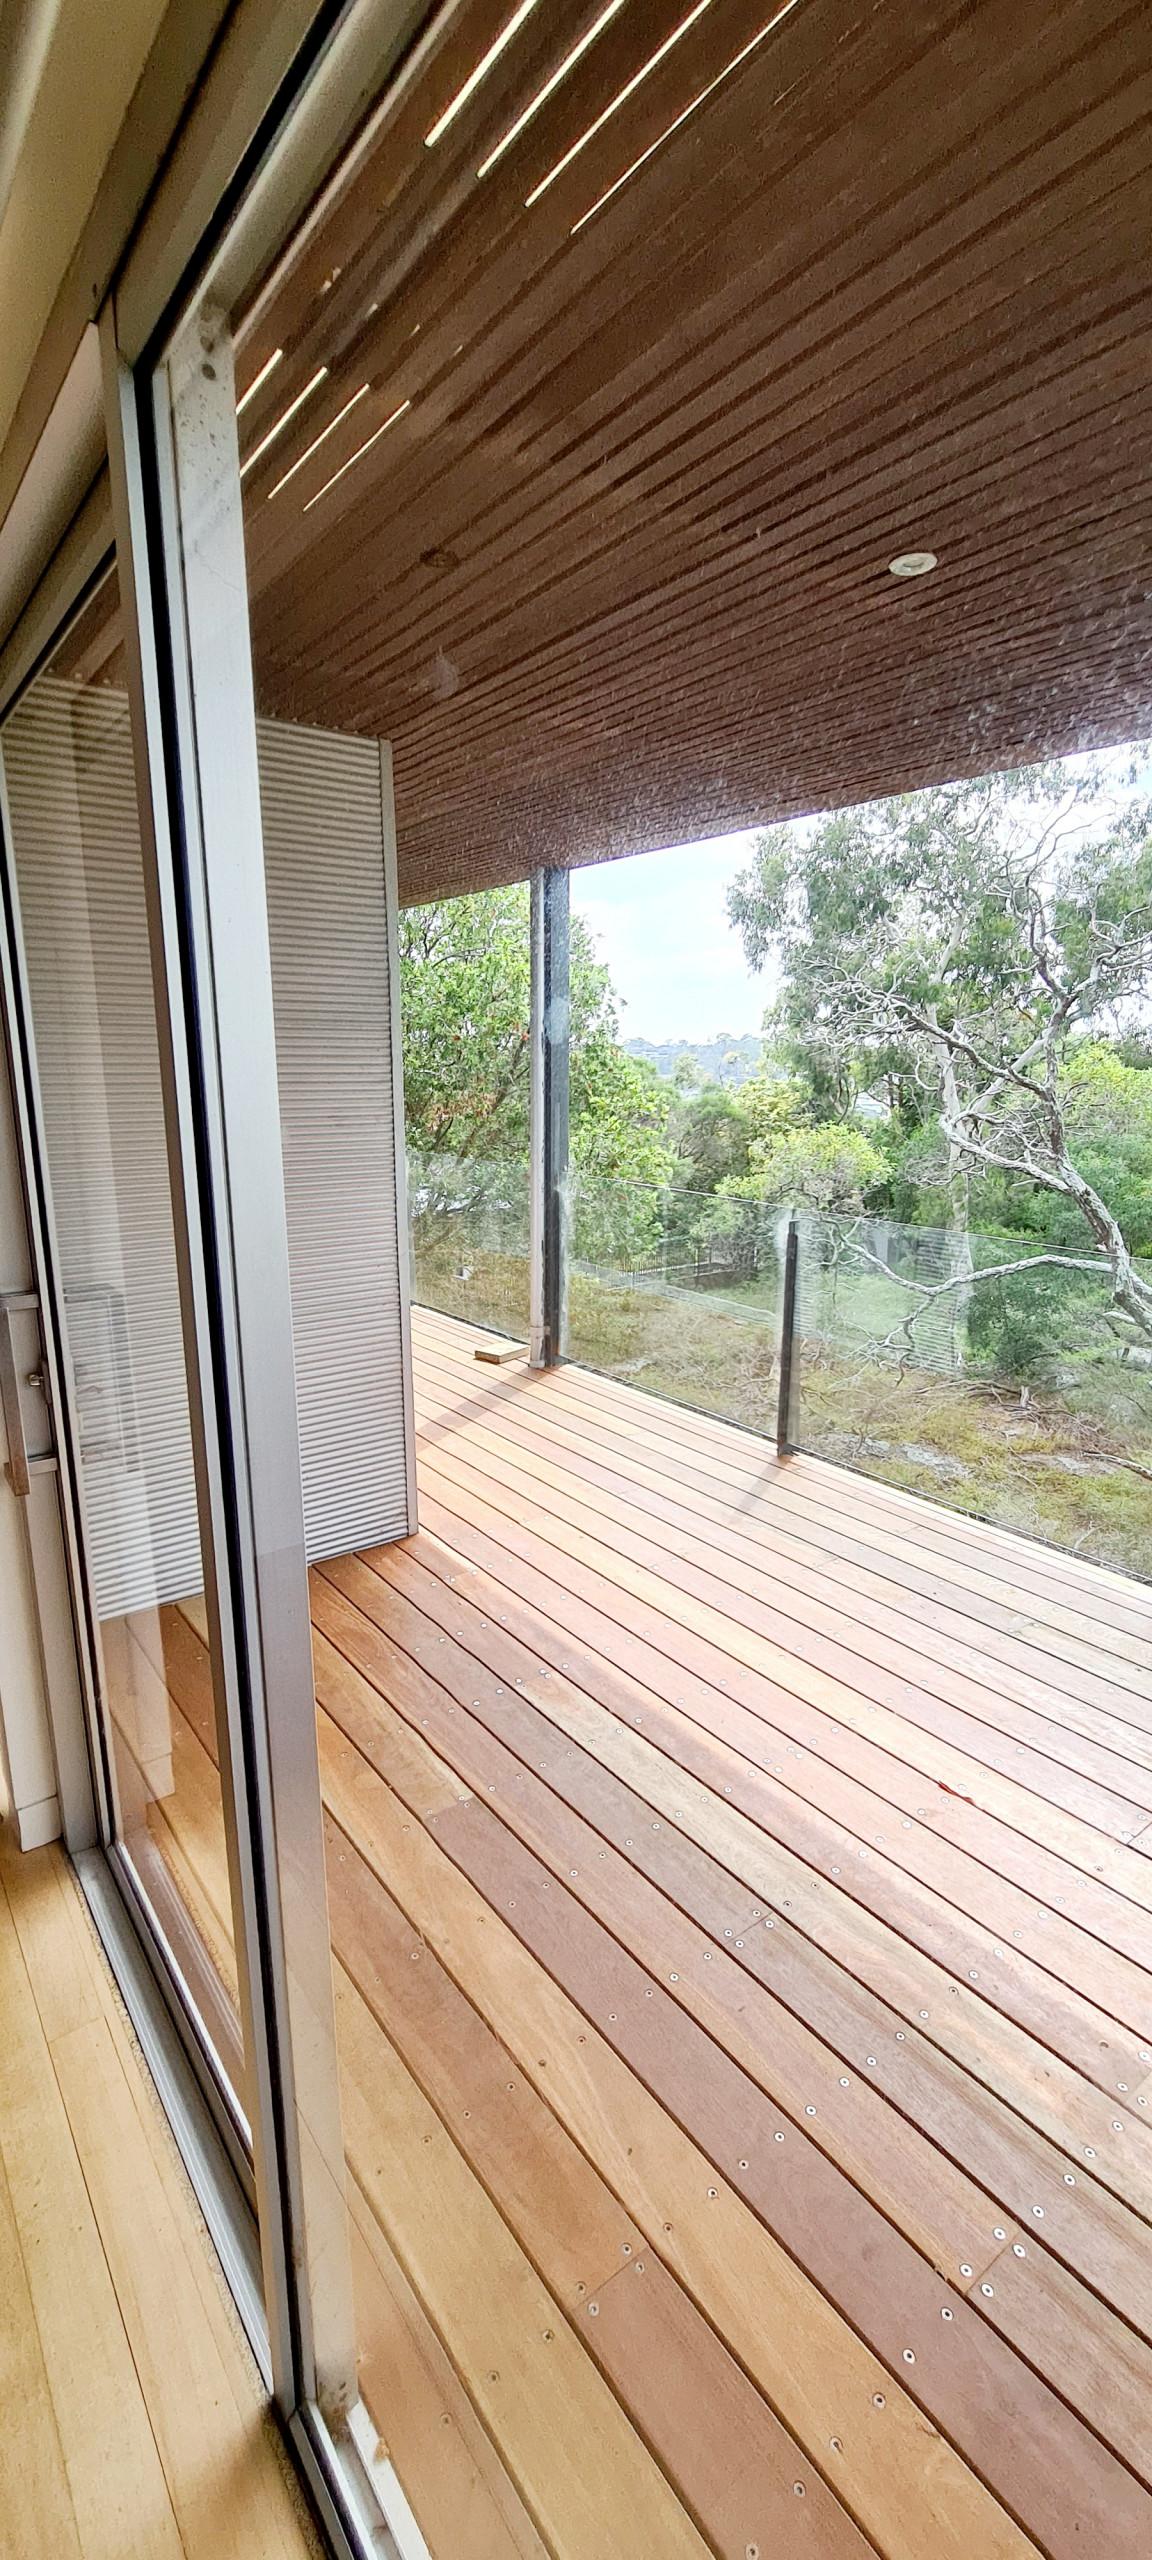 Castlecrag, NSW